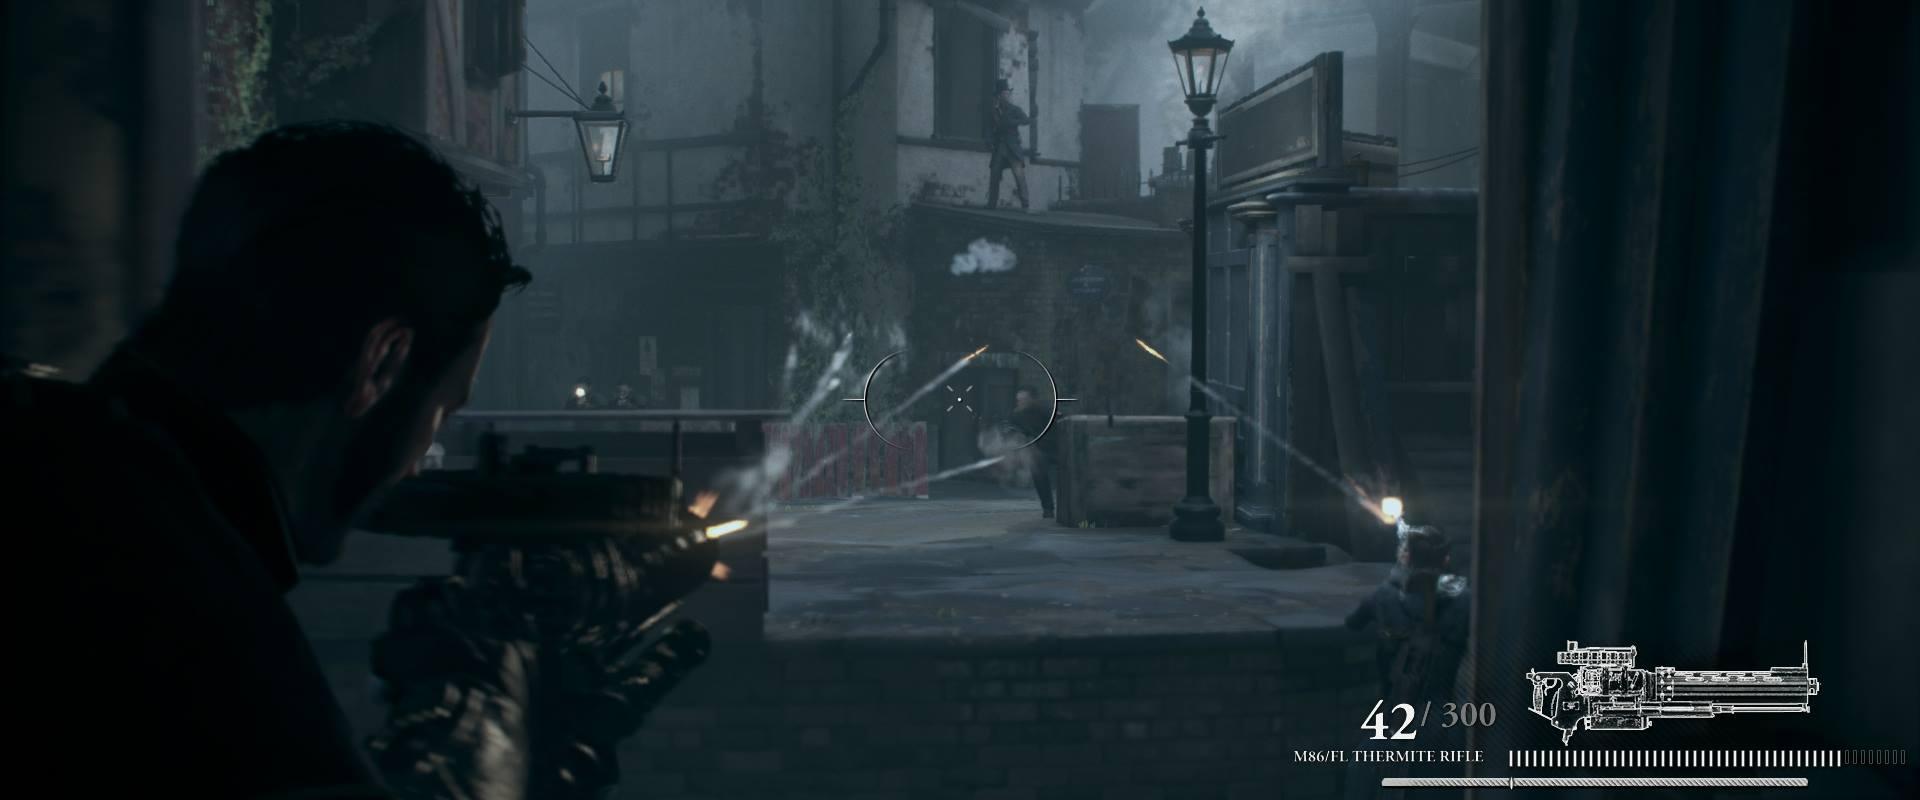 the-order-1886-shooter-gameplay-thermite-gun-screenshot-ps4